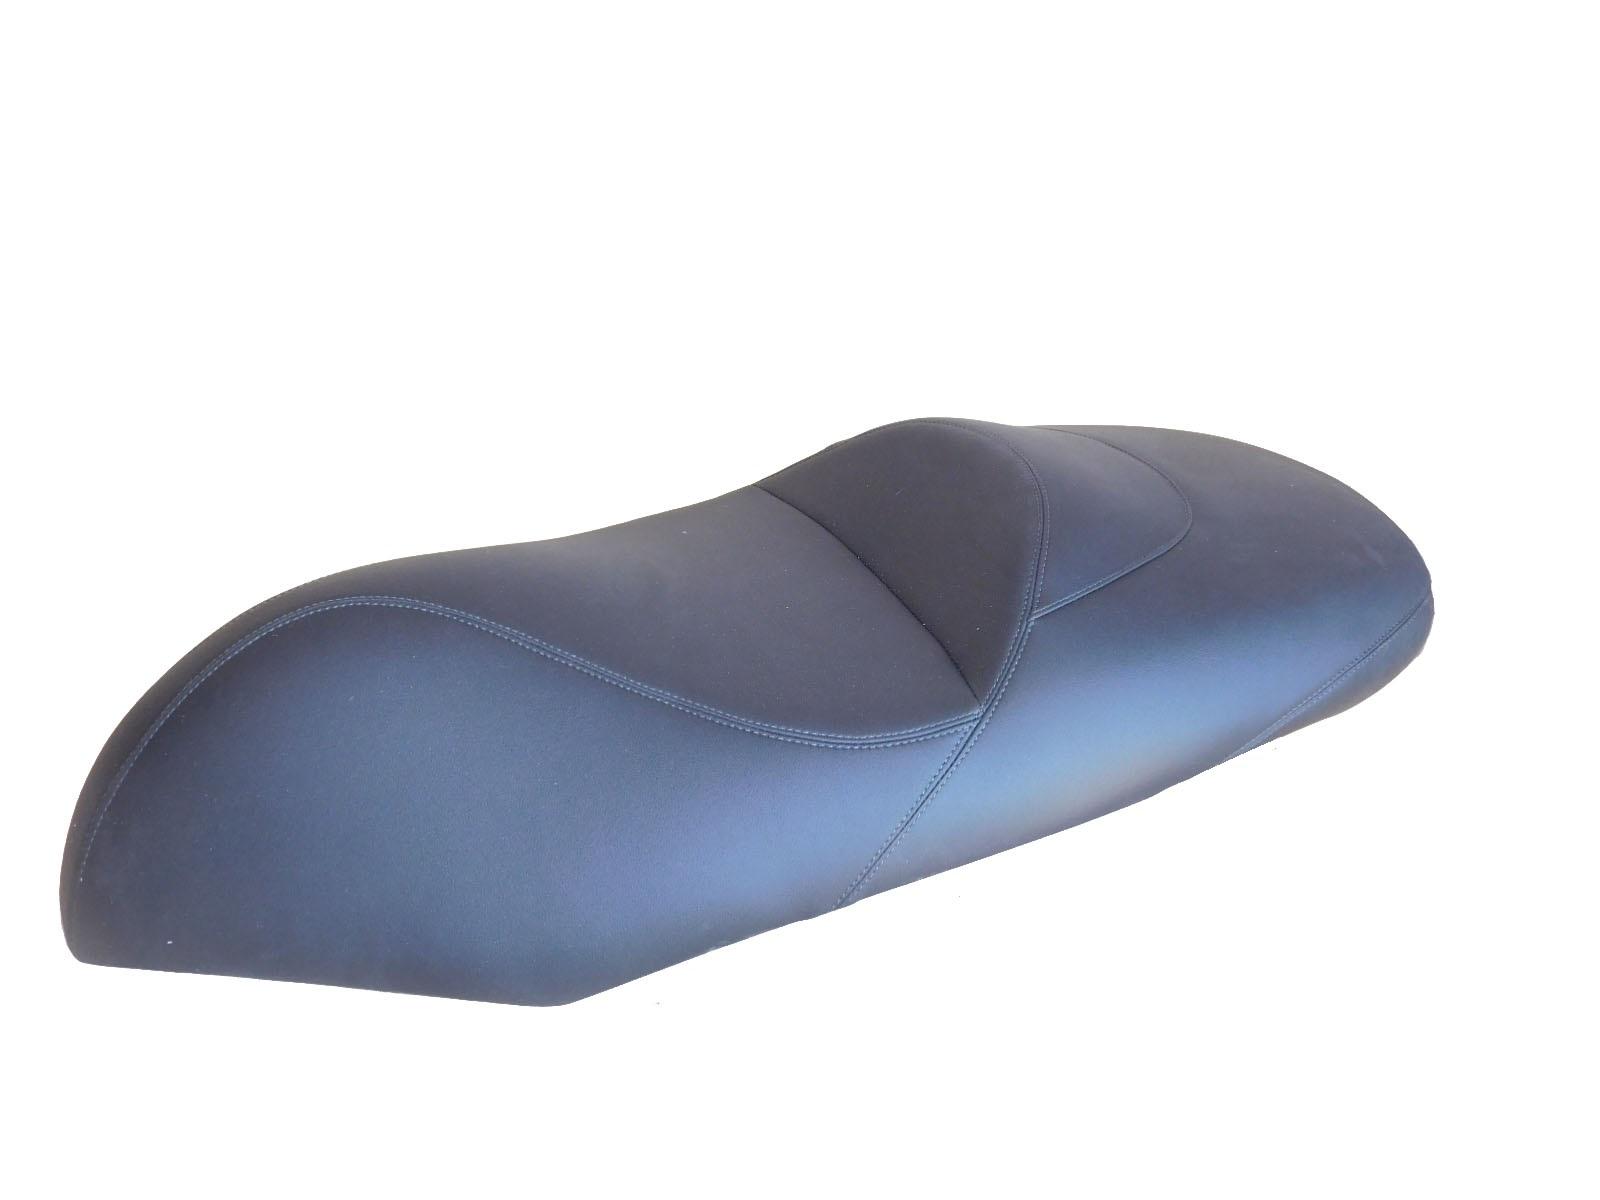 housse de selle design hsd4378 peugeot citystar 125 2011 tarifs pour france. Black Bedroom Furniture Sets. Home Design Ideas